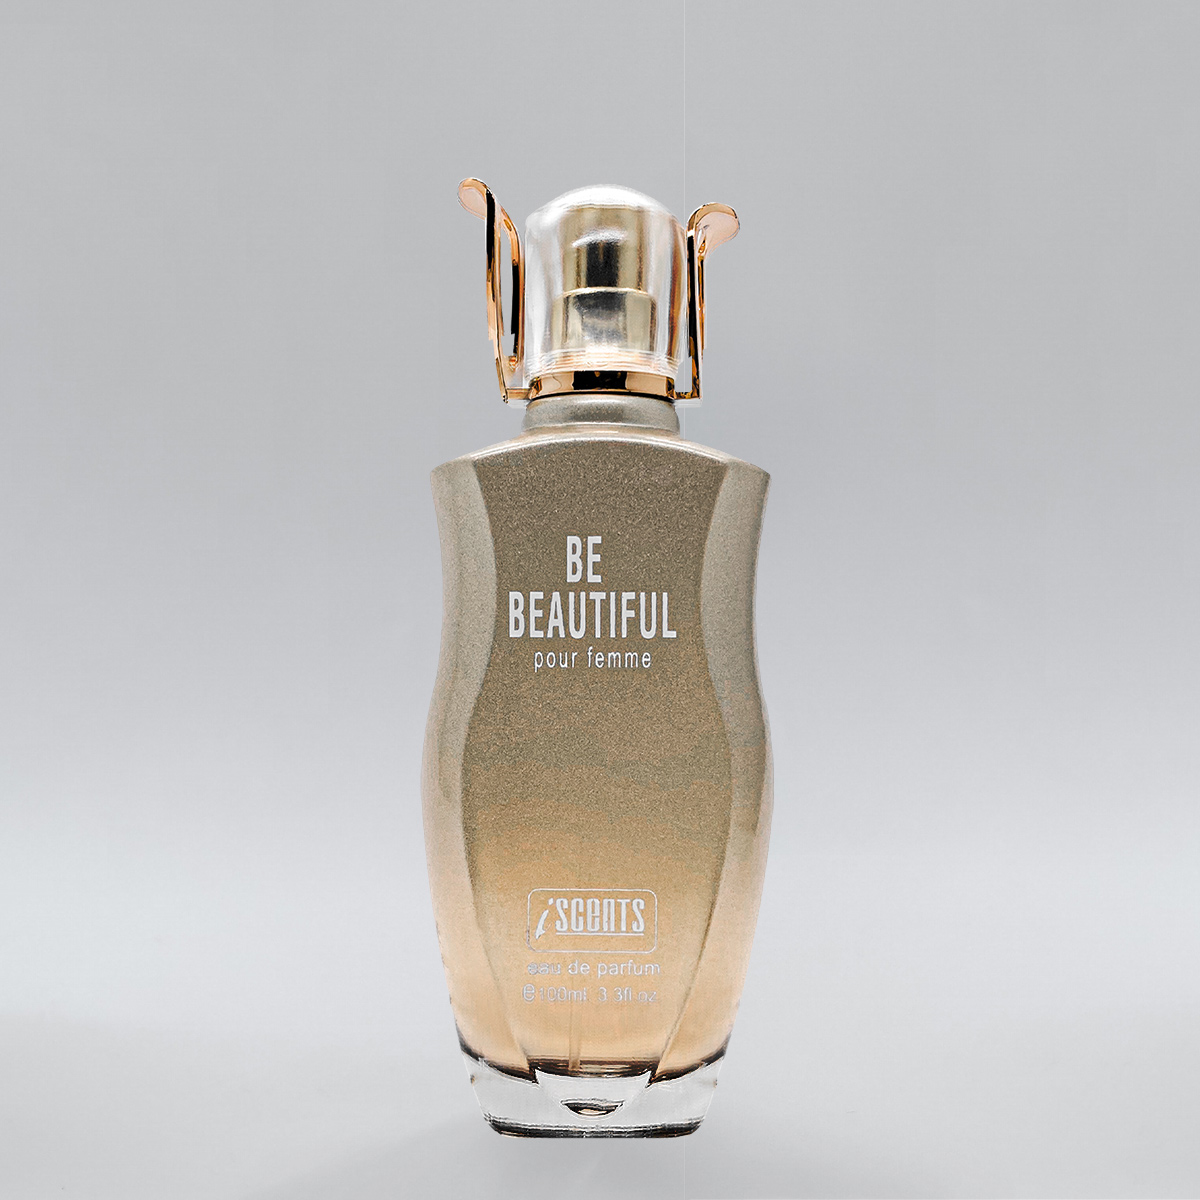 Kit 3 perfumes, Be Beautifull, Fantasia e Ebon I Scents